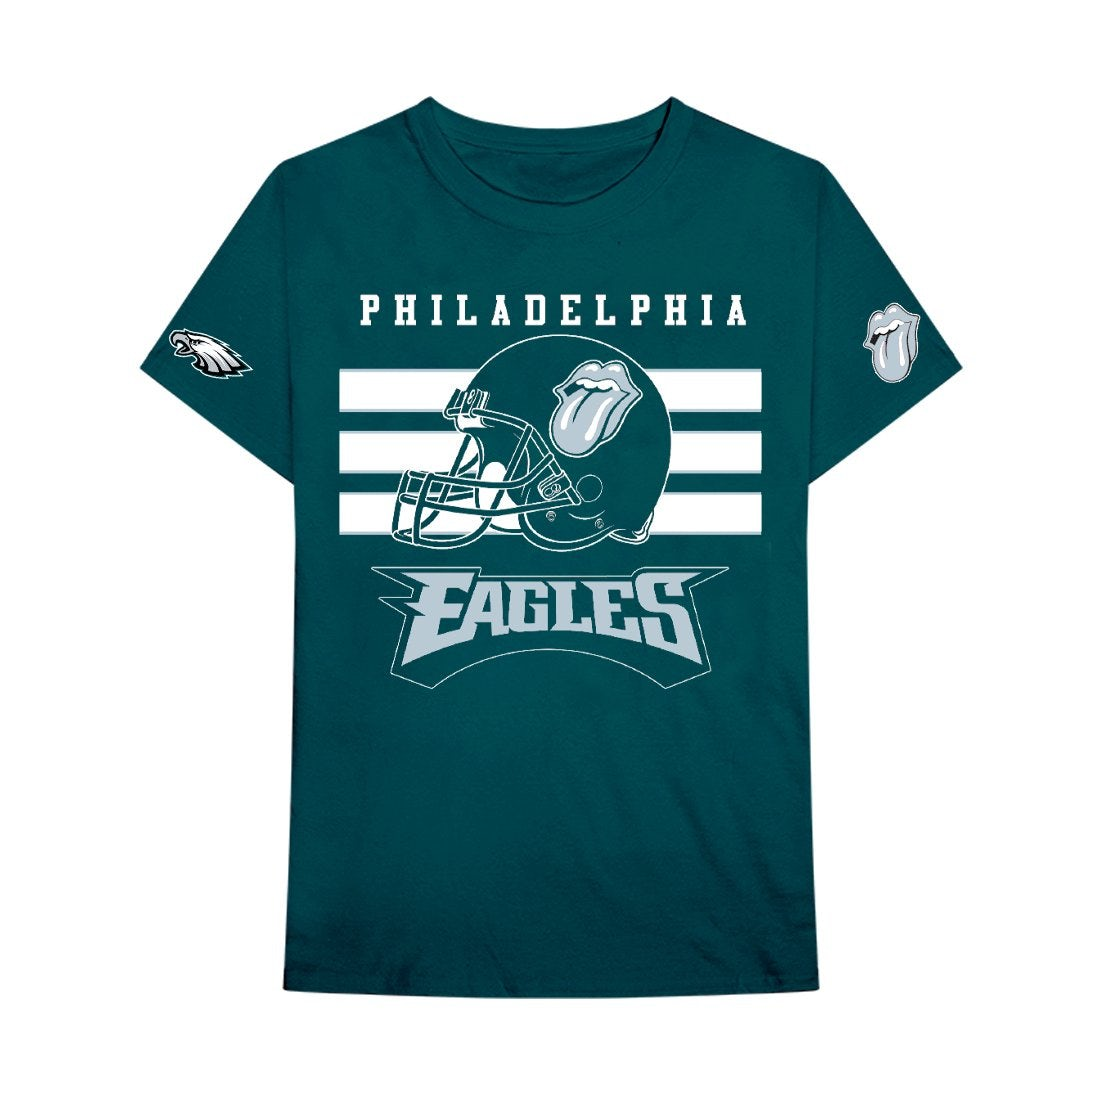 philadelphia eagles t shirts cheap